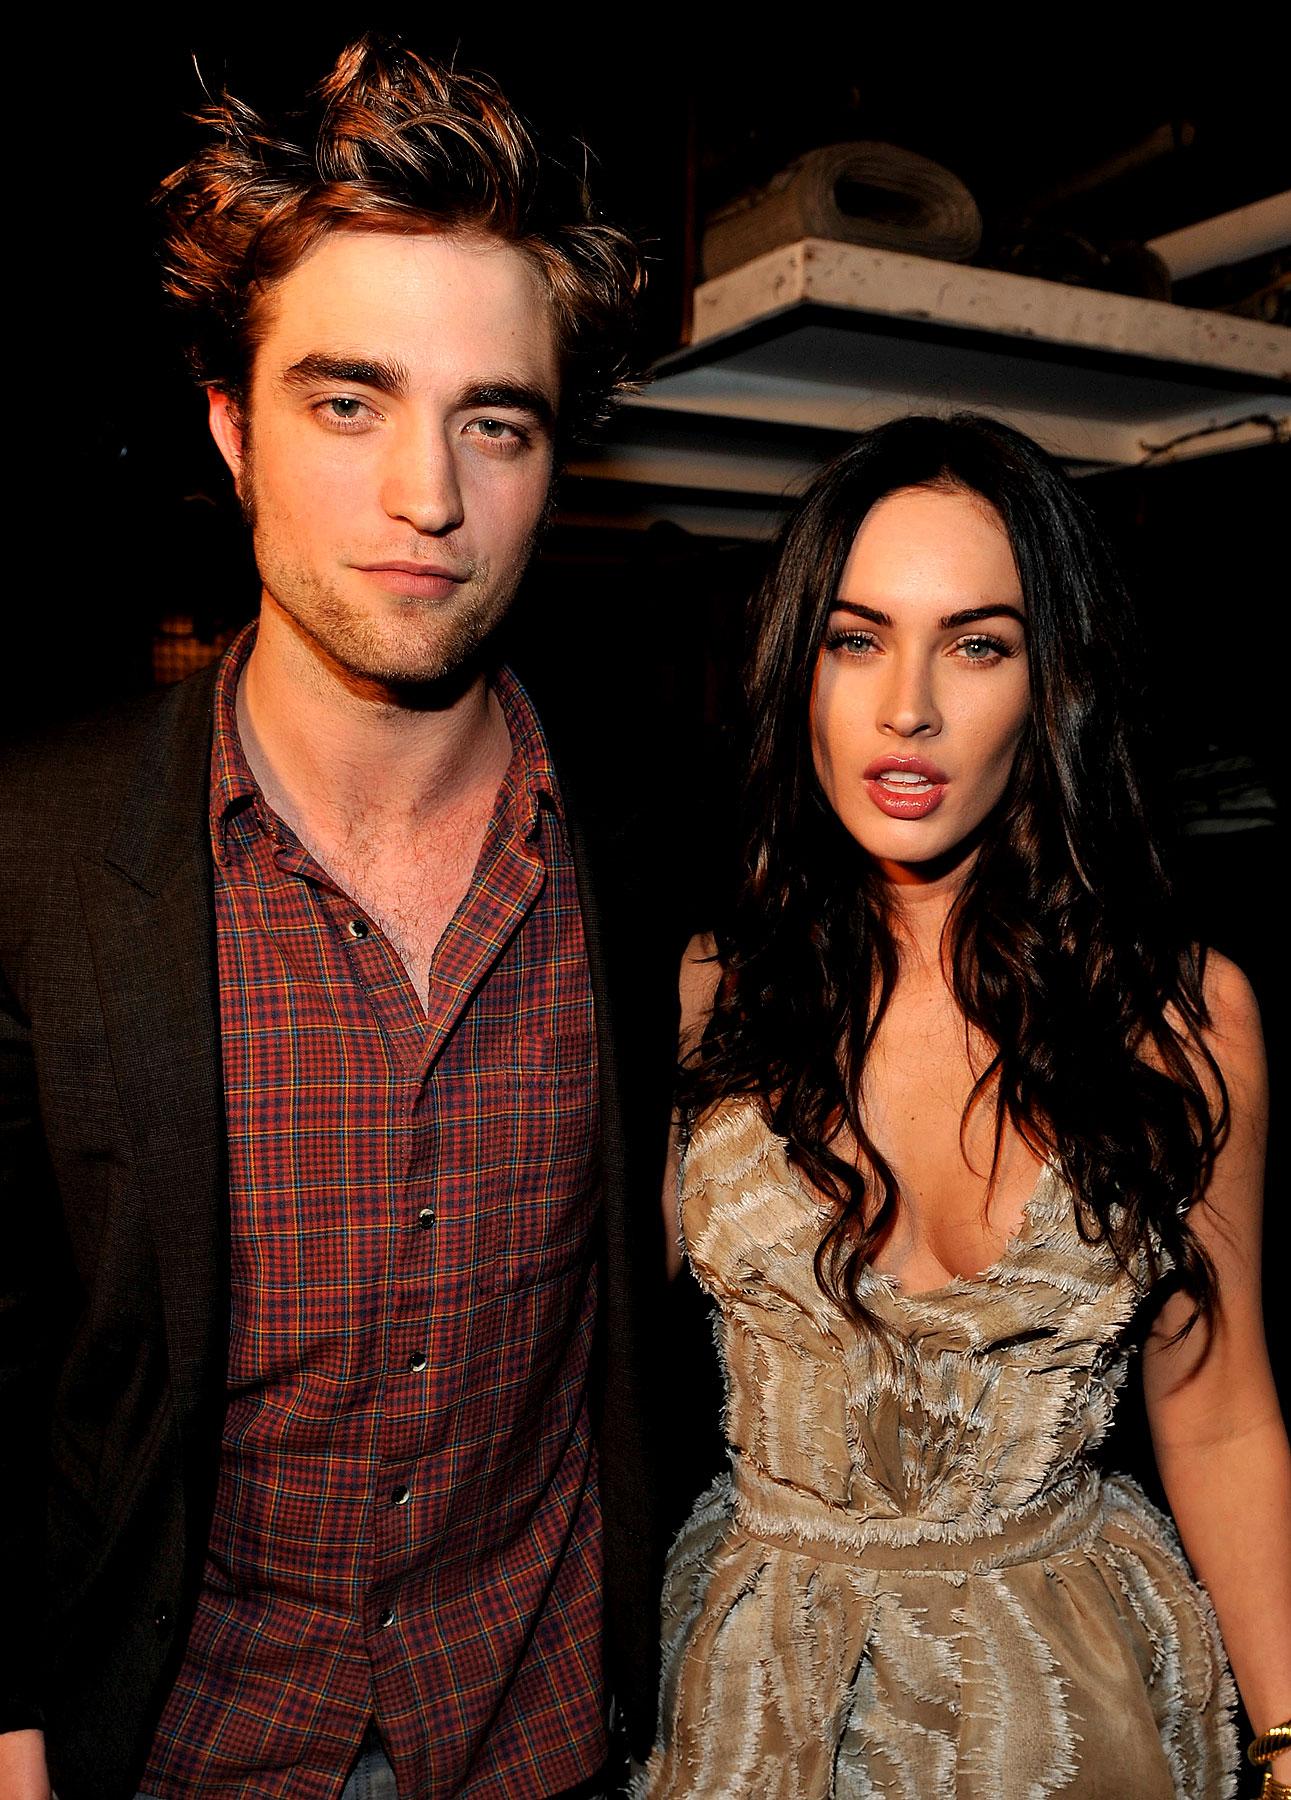 VIDEO: Rob Pattinson and Megan Fox Take The Stage